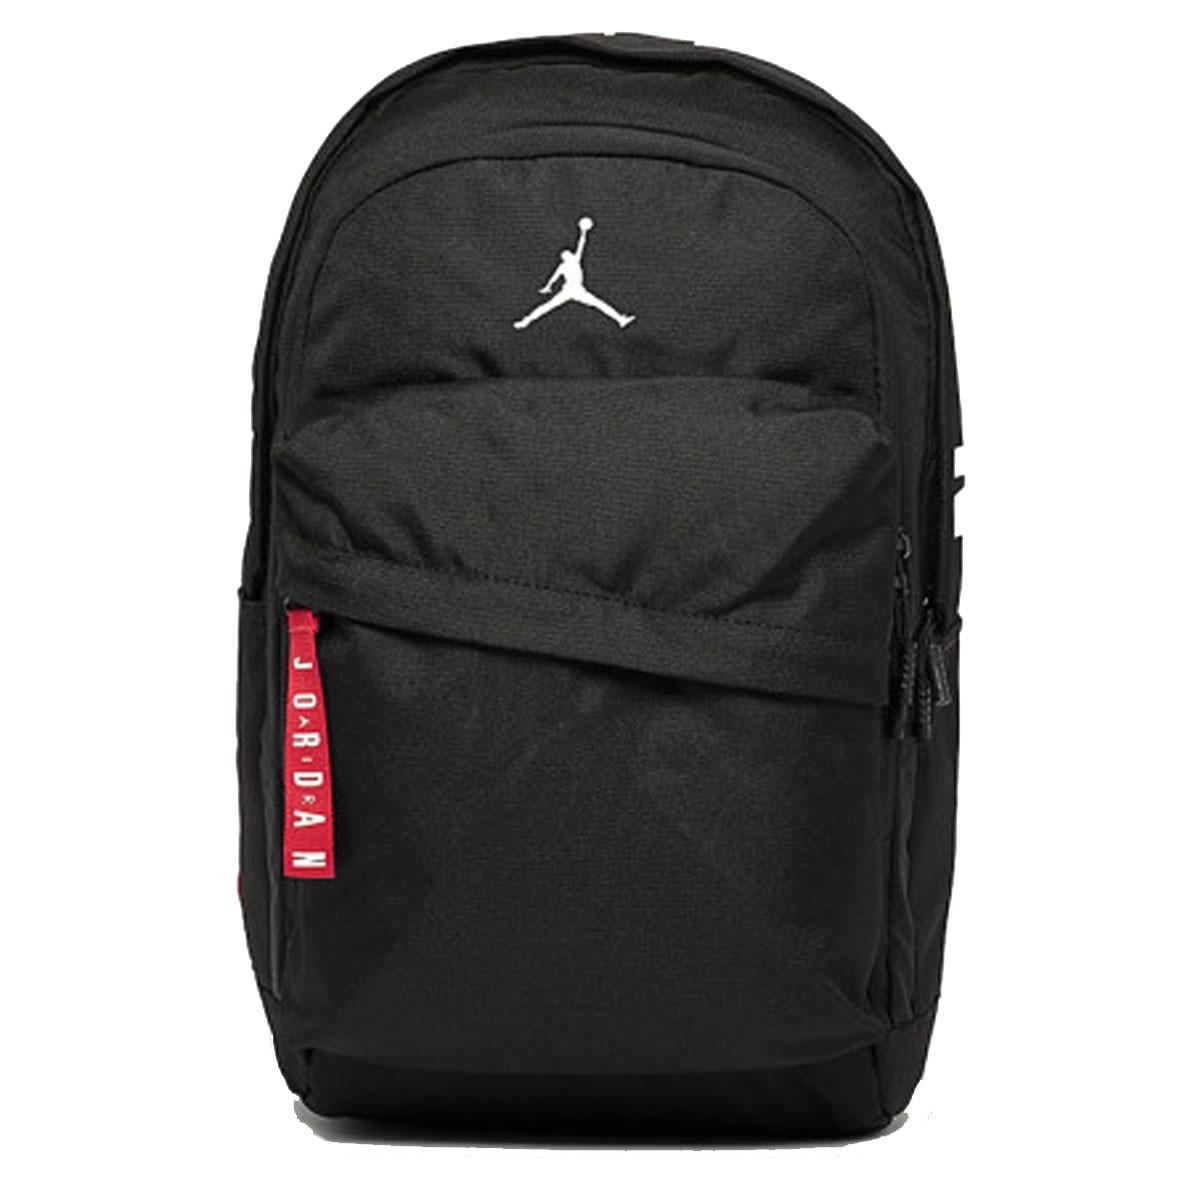 Jordan Air Patrol Backpack 'Black'